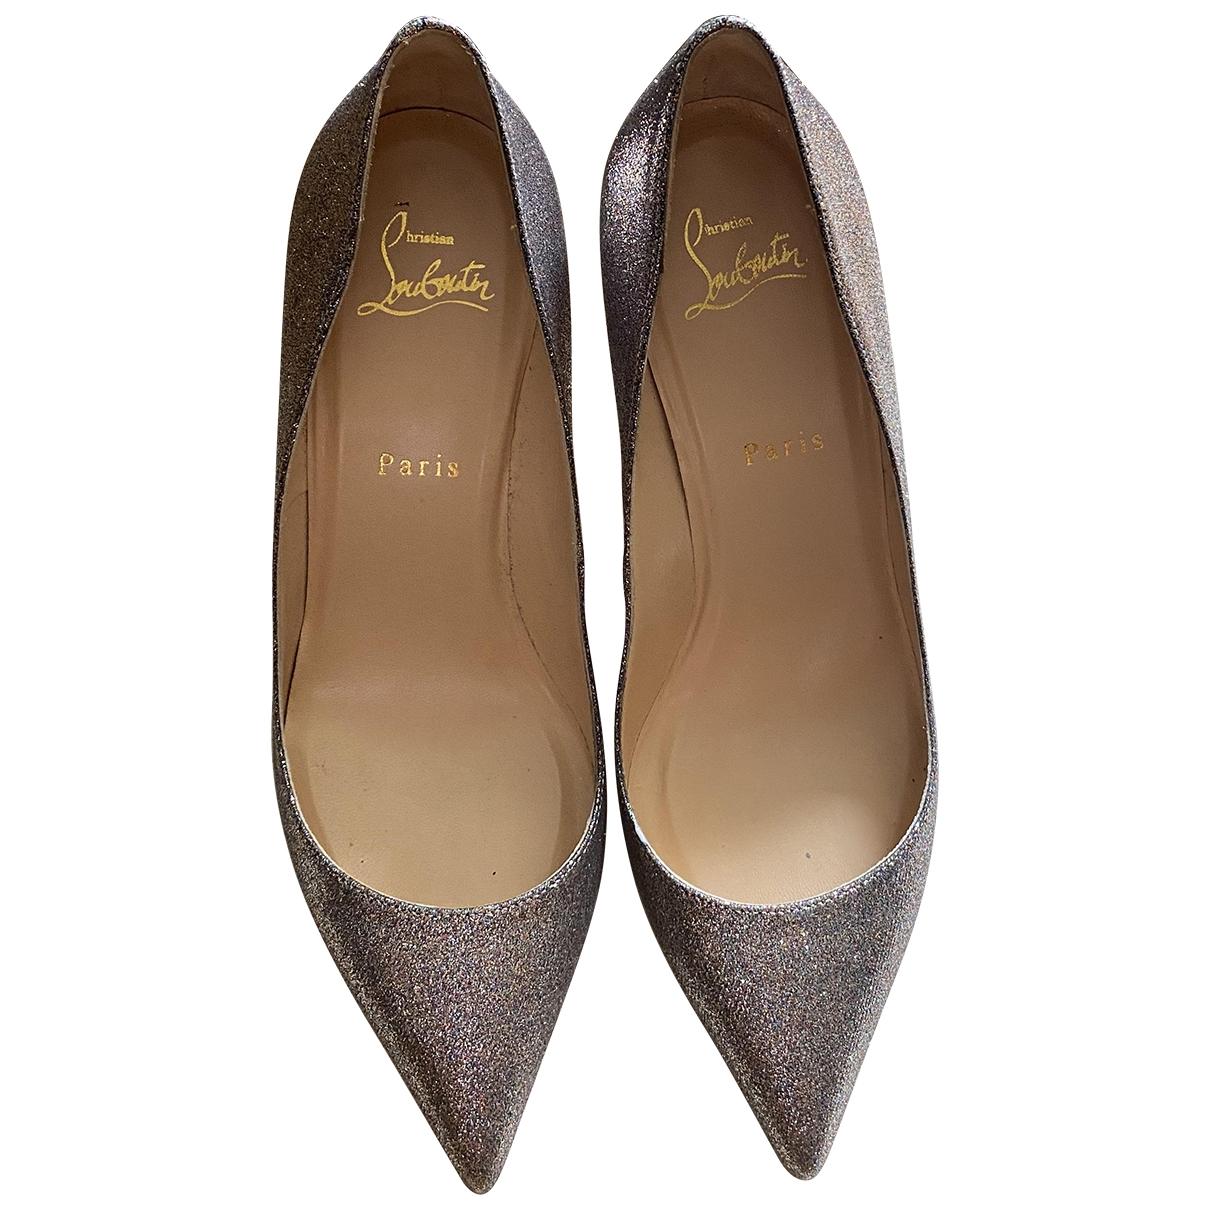 Christian Louboutin Pigalle Metallic Glitter Heels for Women 39 EU